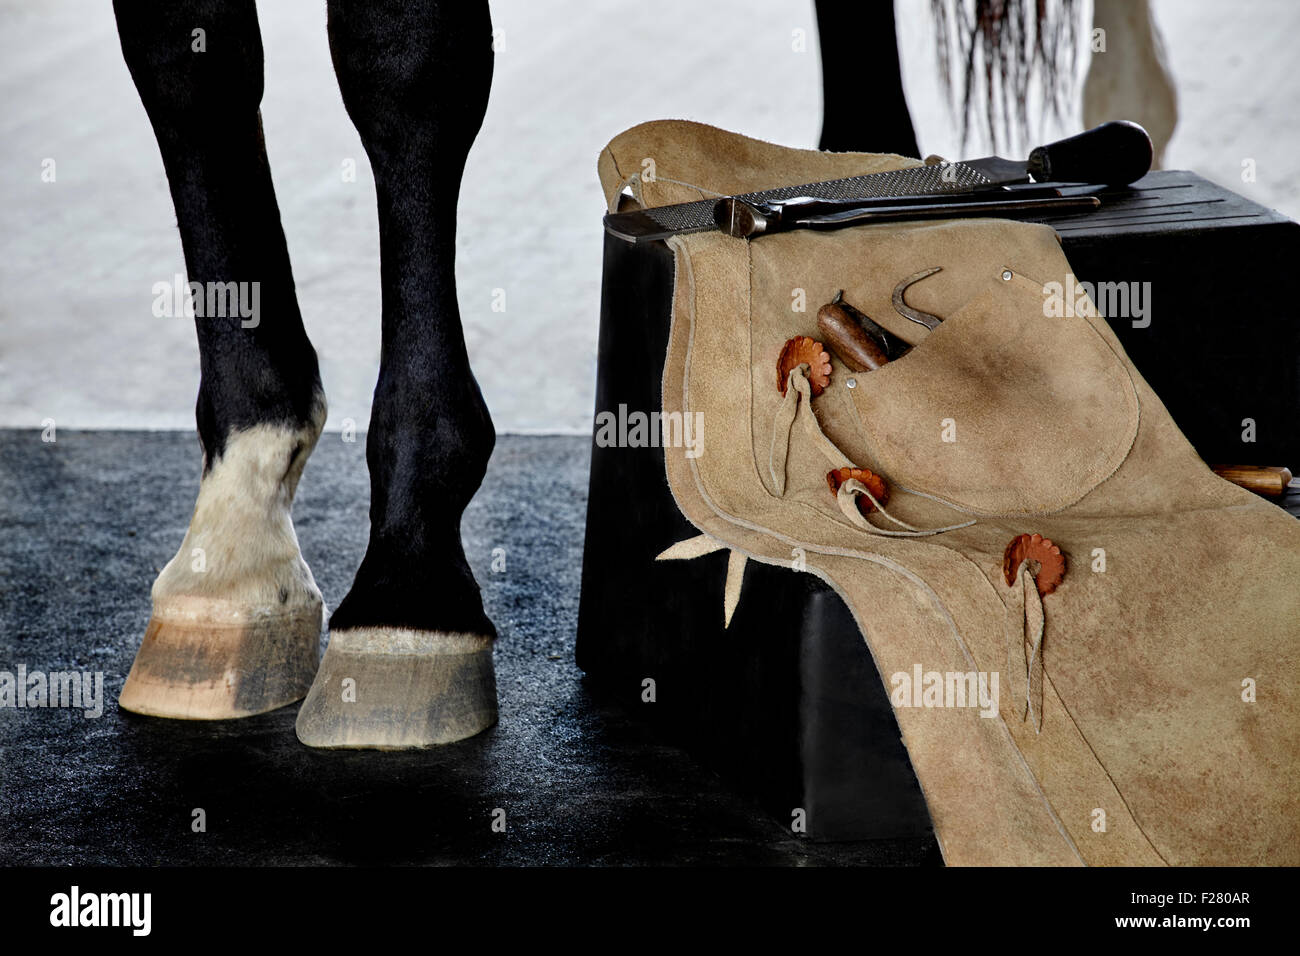 VARIETY OF 8 COLO VINYL HOOF PICK WITH STAINLESS STEEL  PICK HORSE HOOF PICK